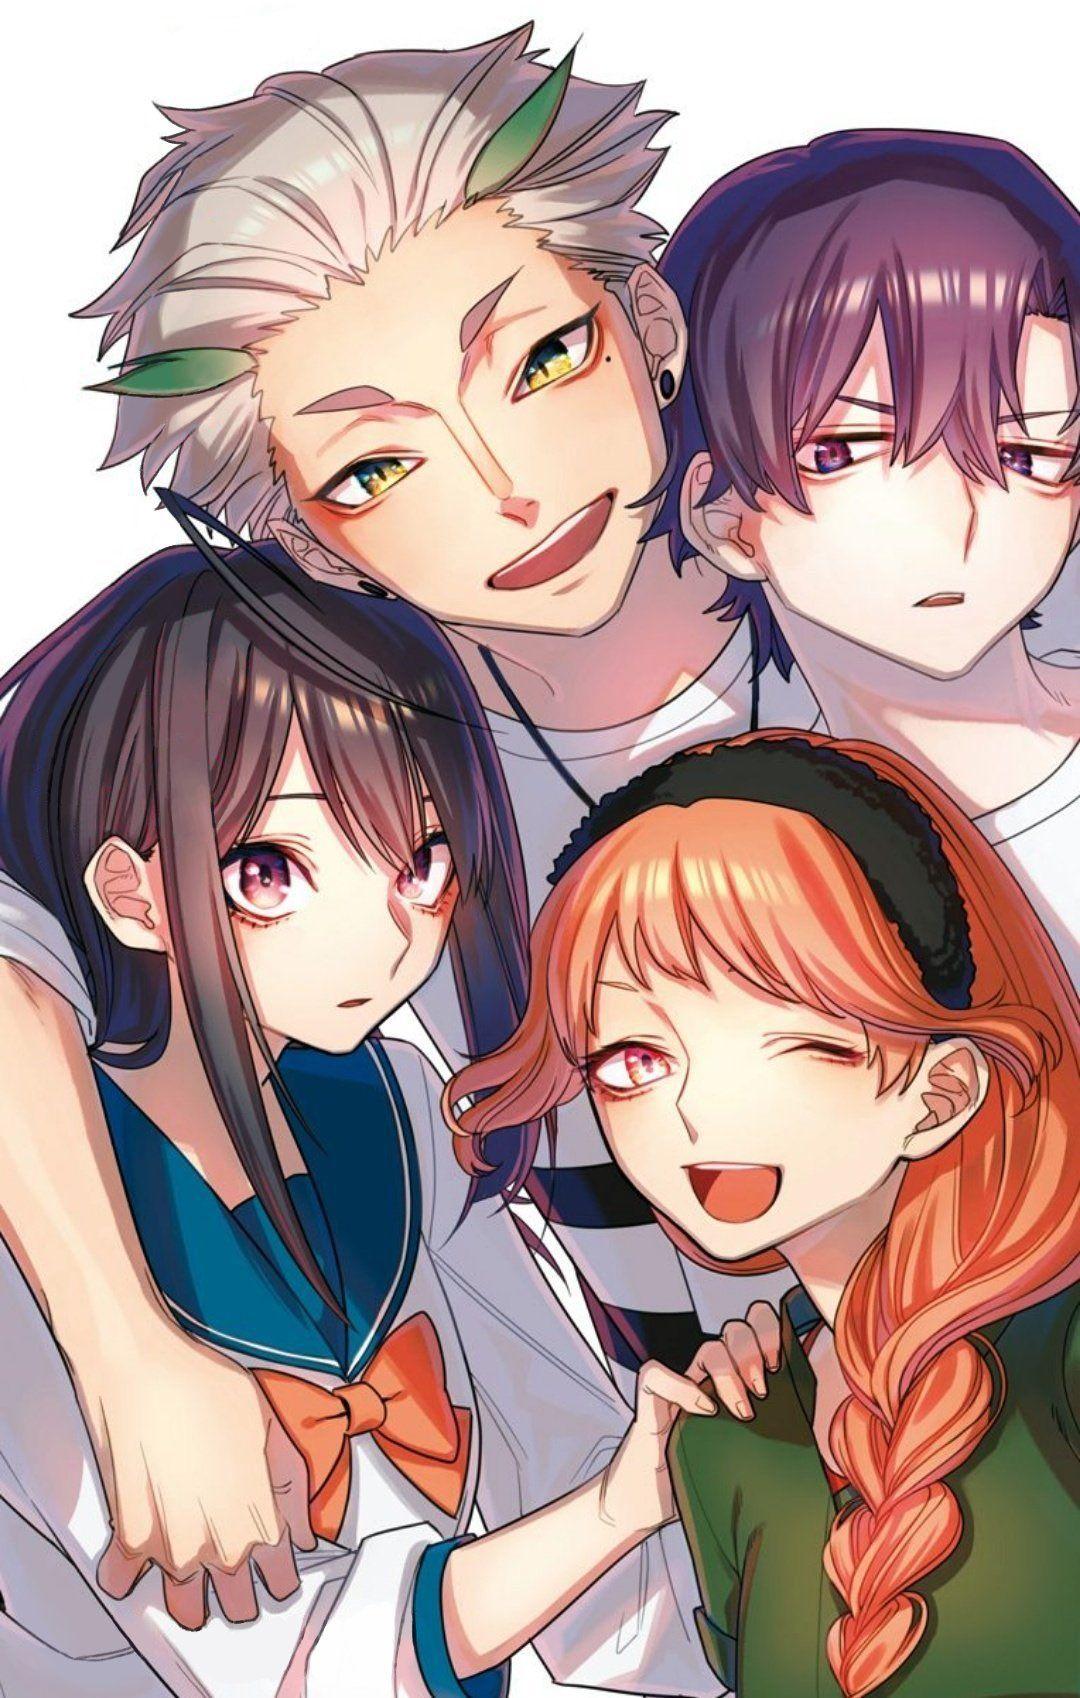 𝘼𝙡𝙚𝙭 👺 on Twitter in 2020 Anime, Manga, Age